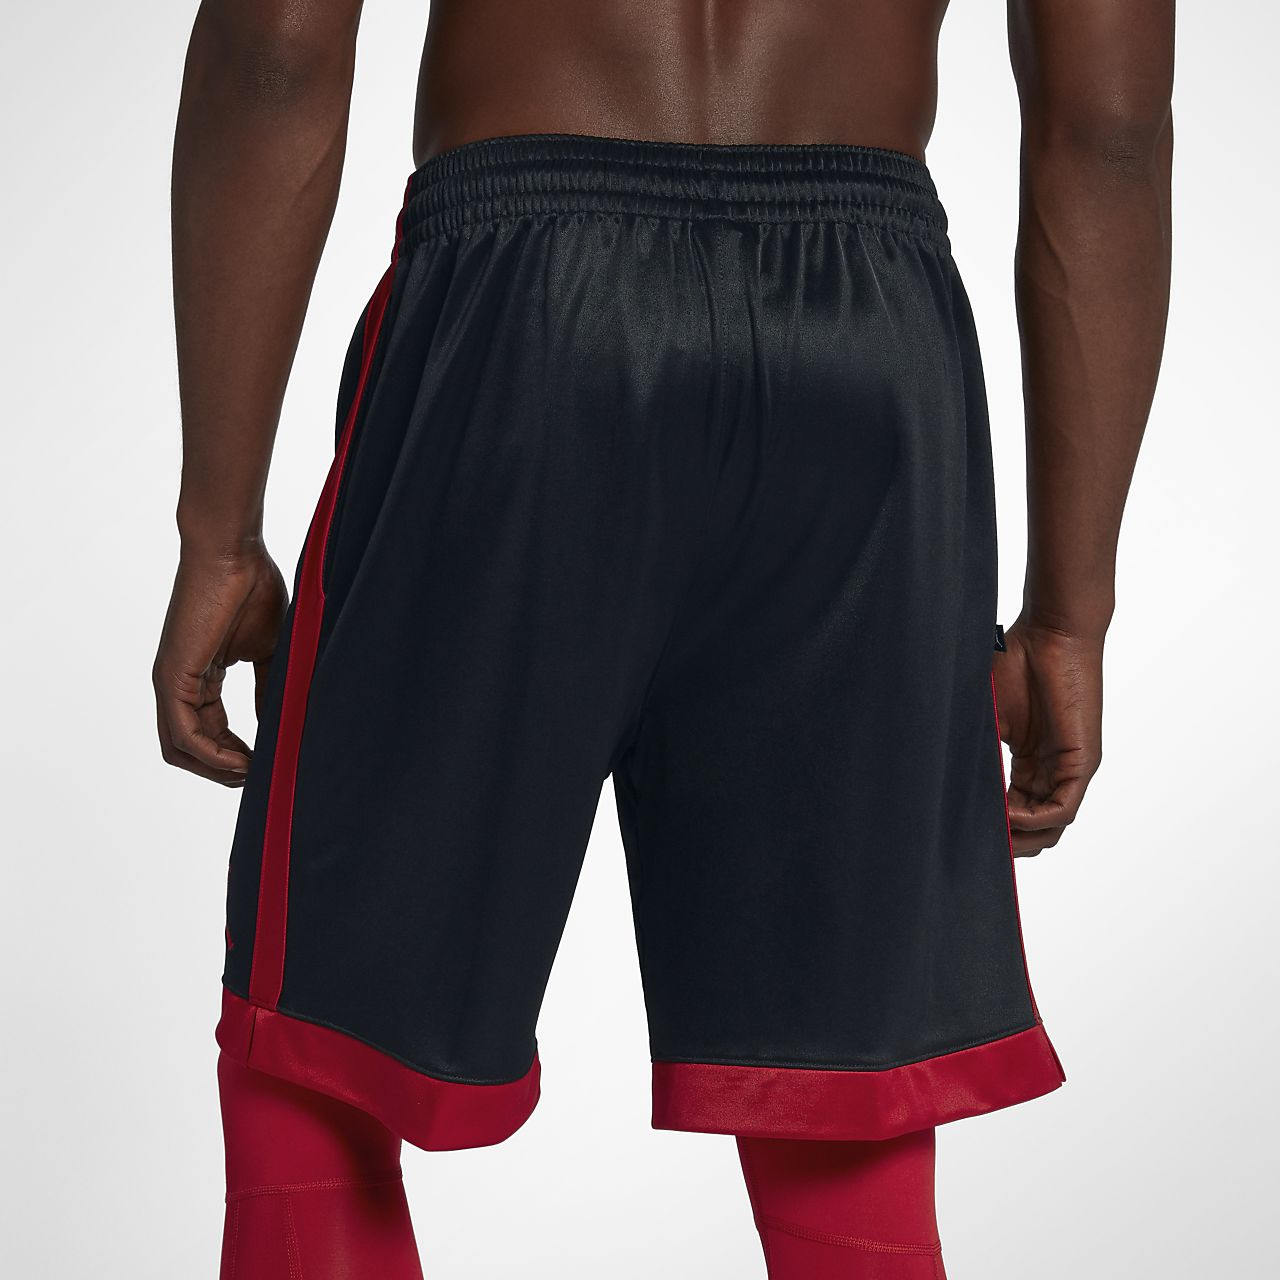 1faa45c7c71914 Jordan Shimmer Men s Basketball Shorts. Nike.com NZ